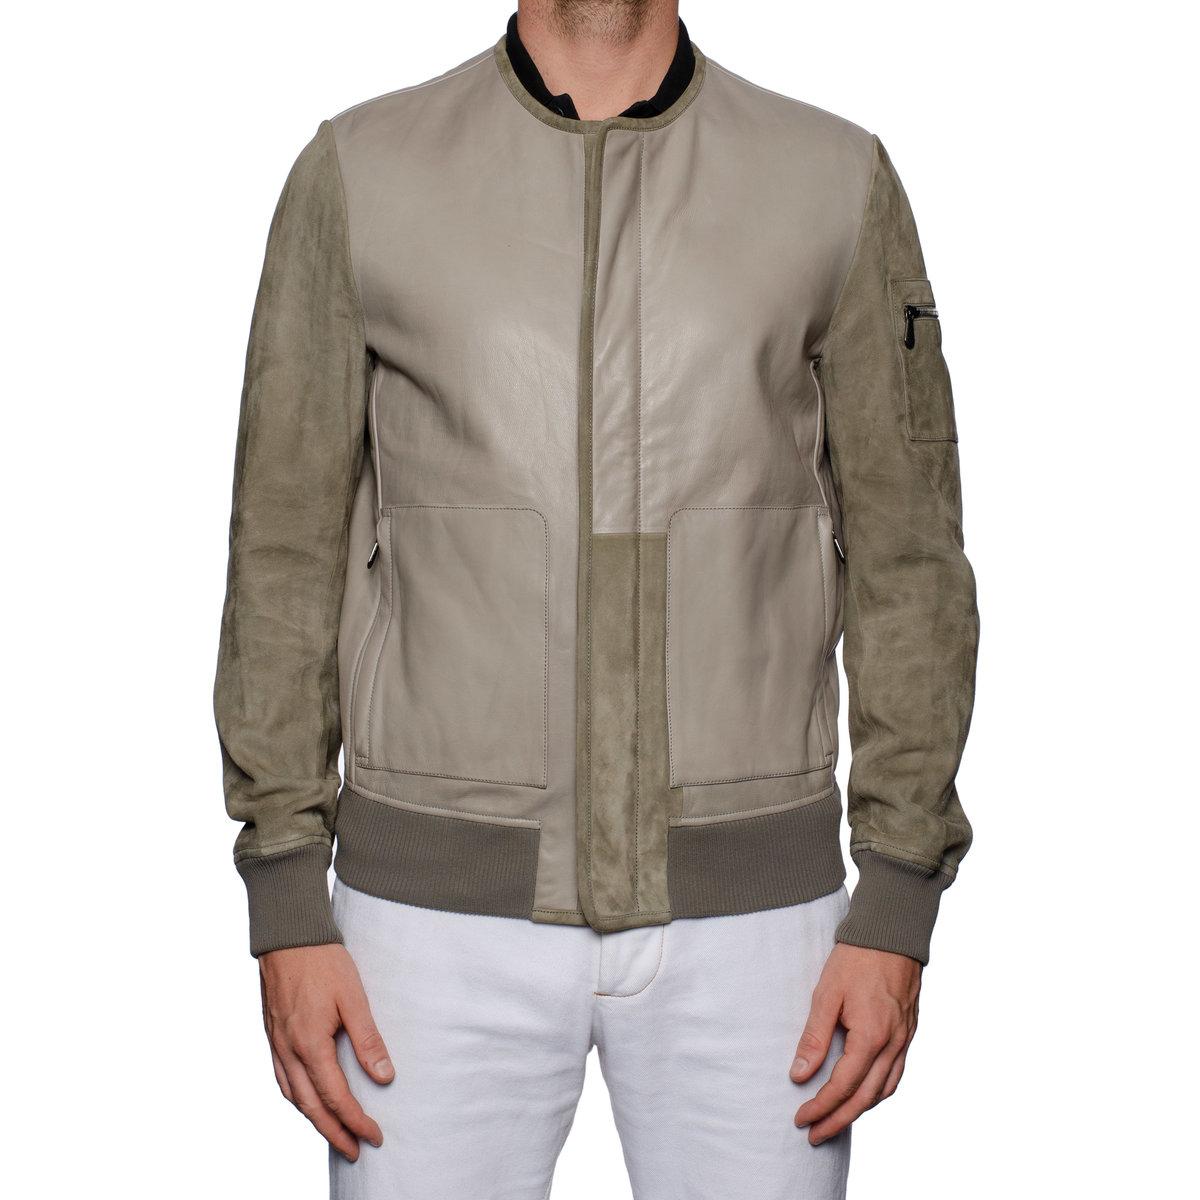 BOTTEGA VENETA Gray Taurus Leather Bomber Jacket with Velvet Cotton Lining 50 US M7.jpg